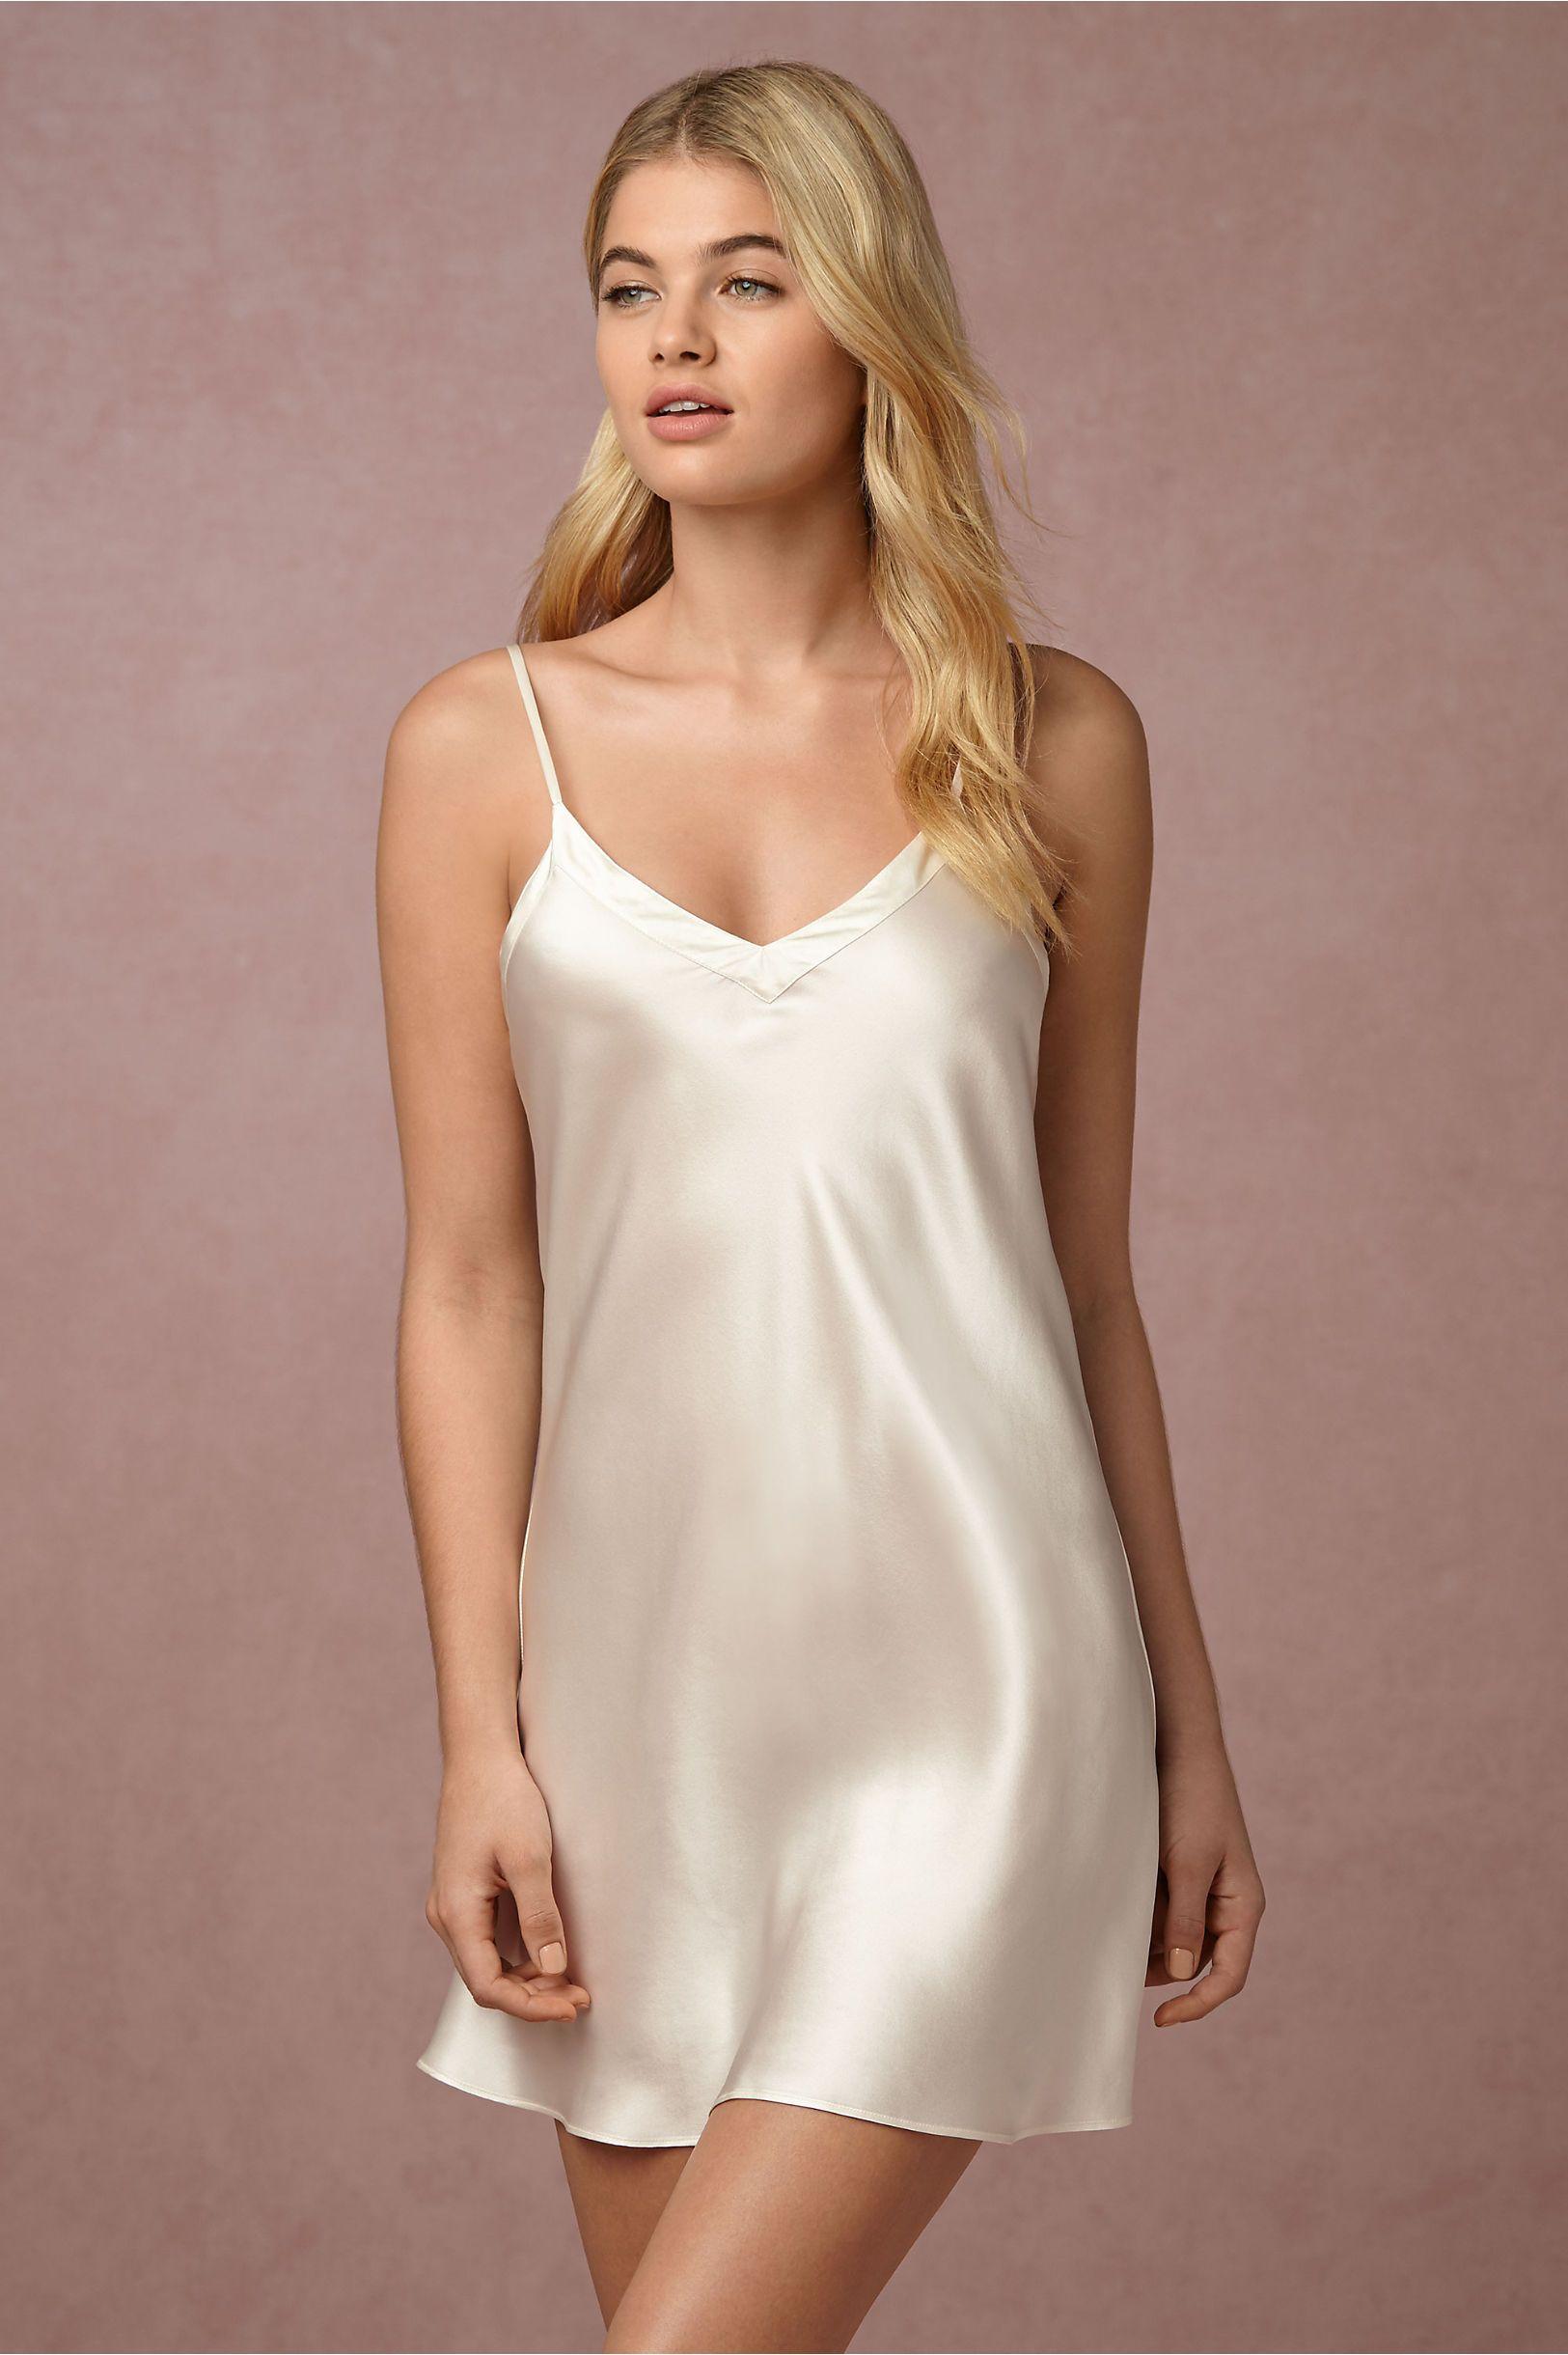 BHLDN Alma Silk Chemise in Bride Bridal Lingerie  98ccc45e7